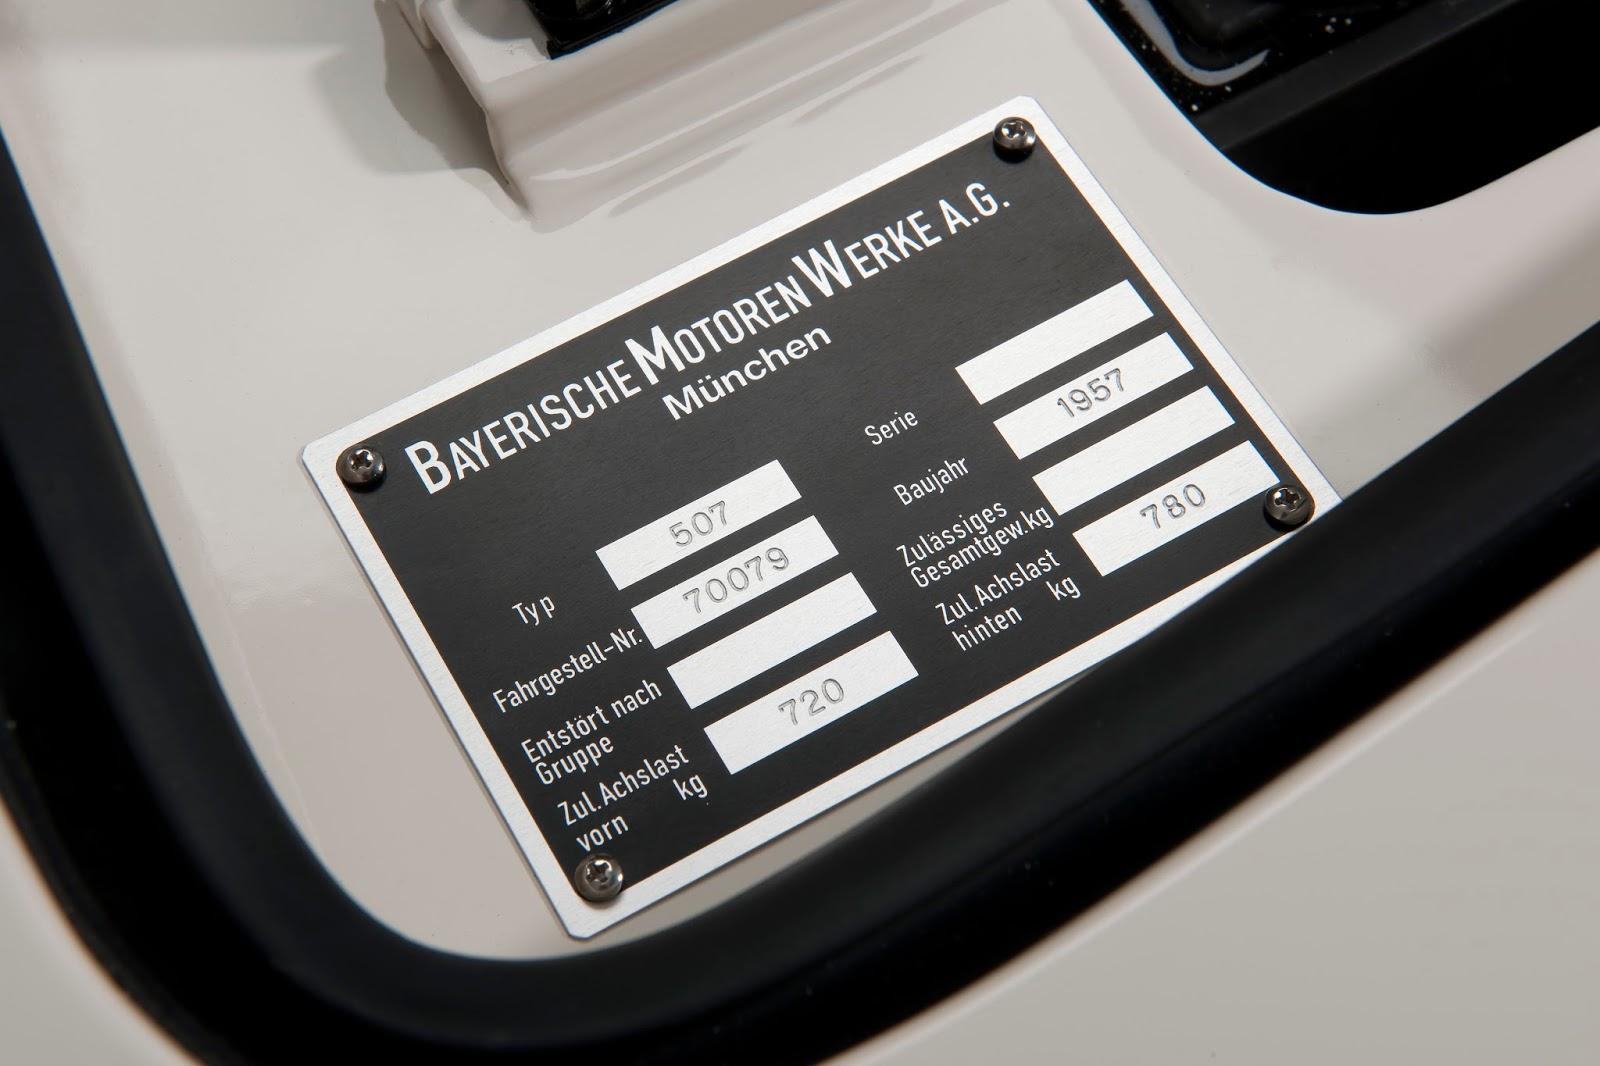 P90229737 highRes elvis bmw 507 08 201 1 Η επιστροφή της μυθικής BMW 507 του Elvis στο Concours d'Elegance, Pebble Beach autoshow, BMW, BMW 507, Classic, Concours d'Elegance, Roadster, zblog